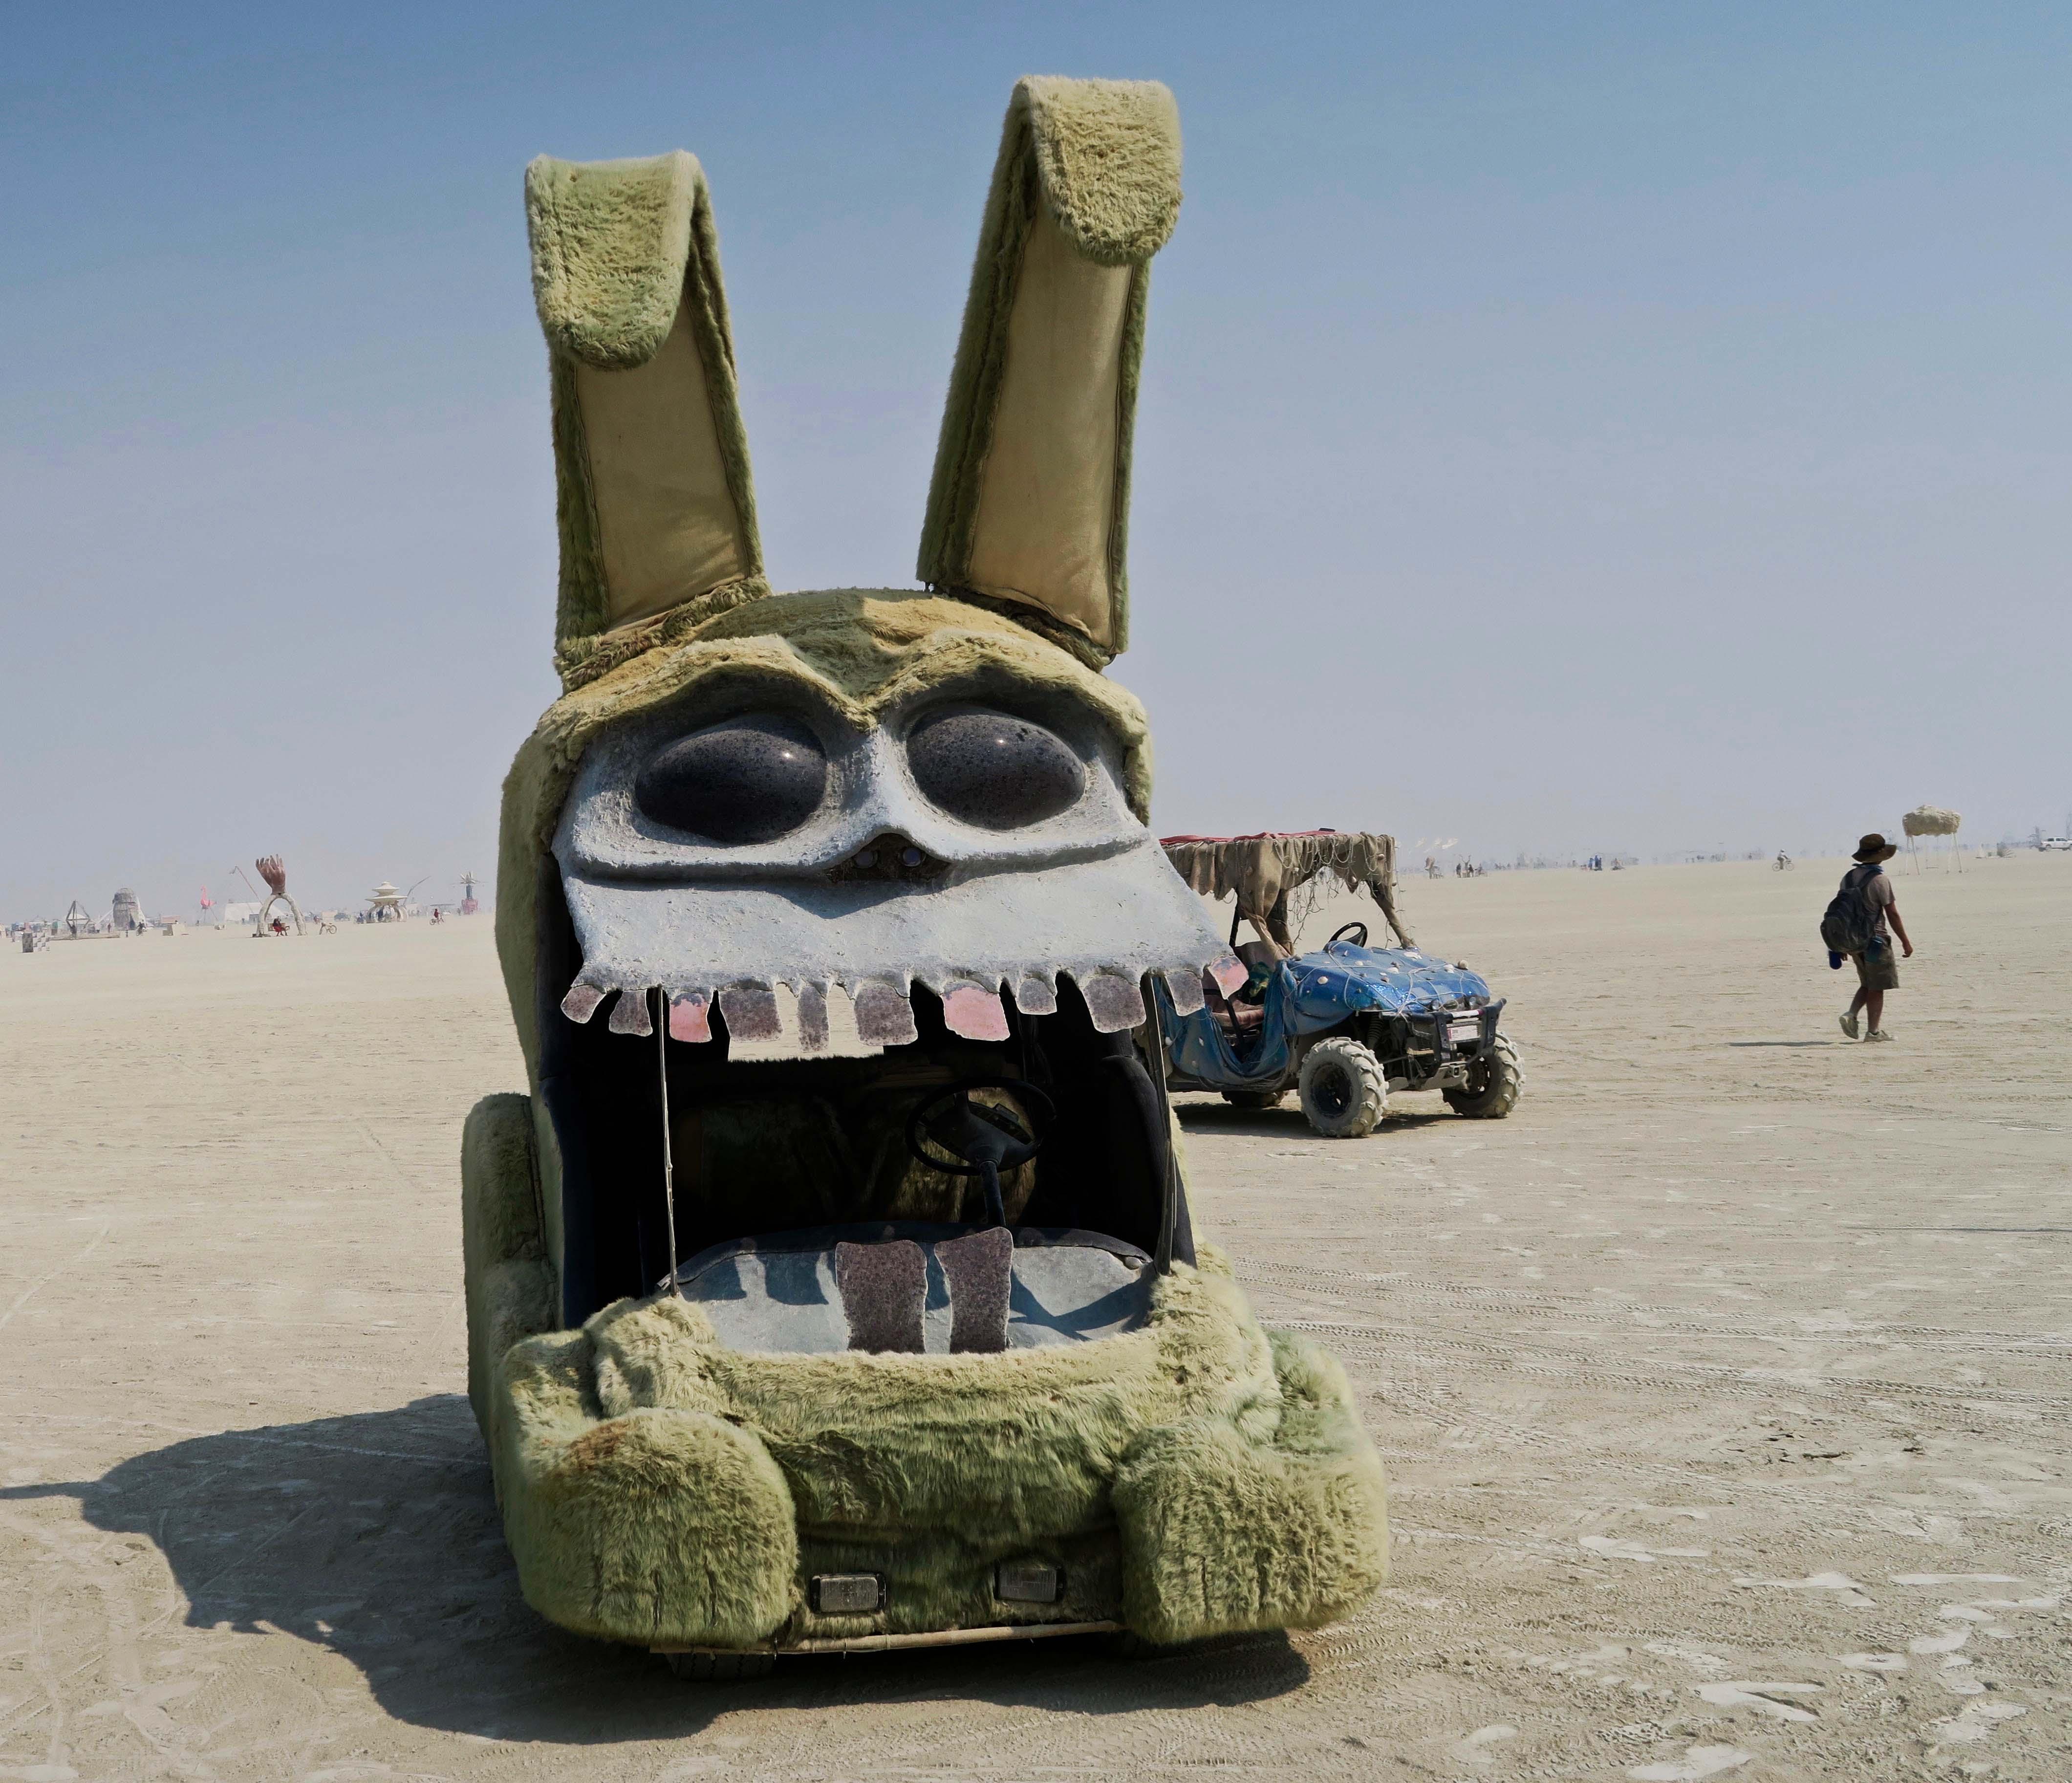 Mad rabbit mutant vehicle at Burning Man 2017